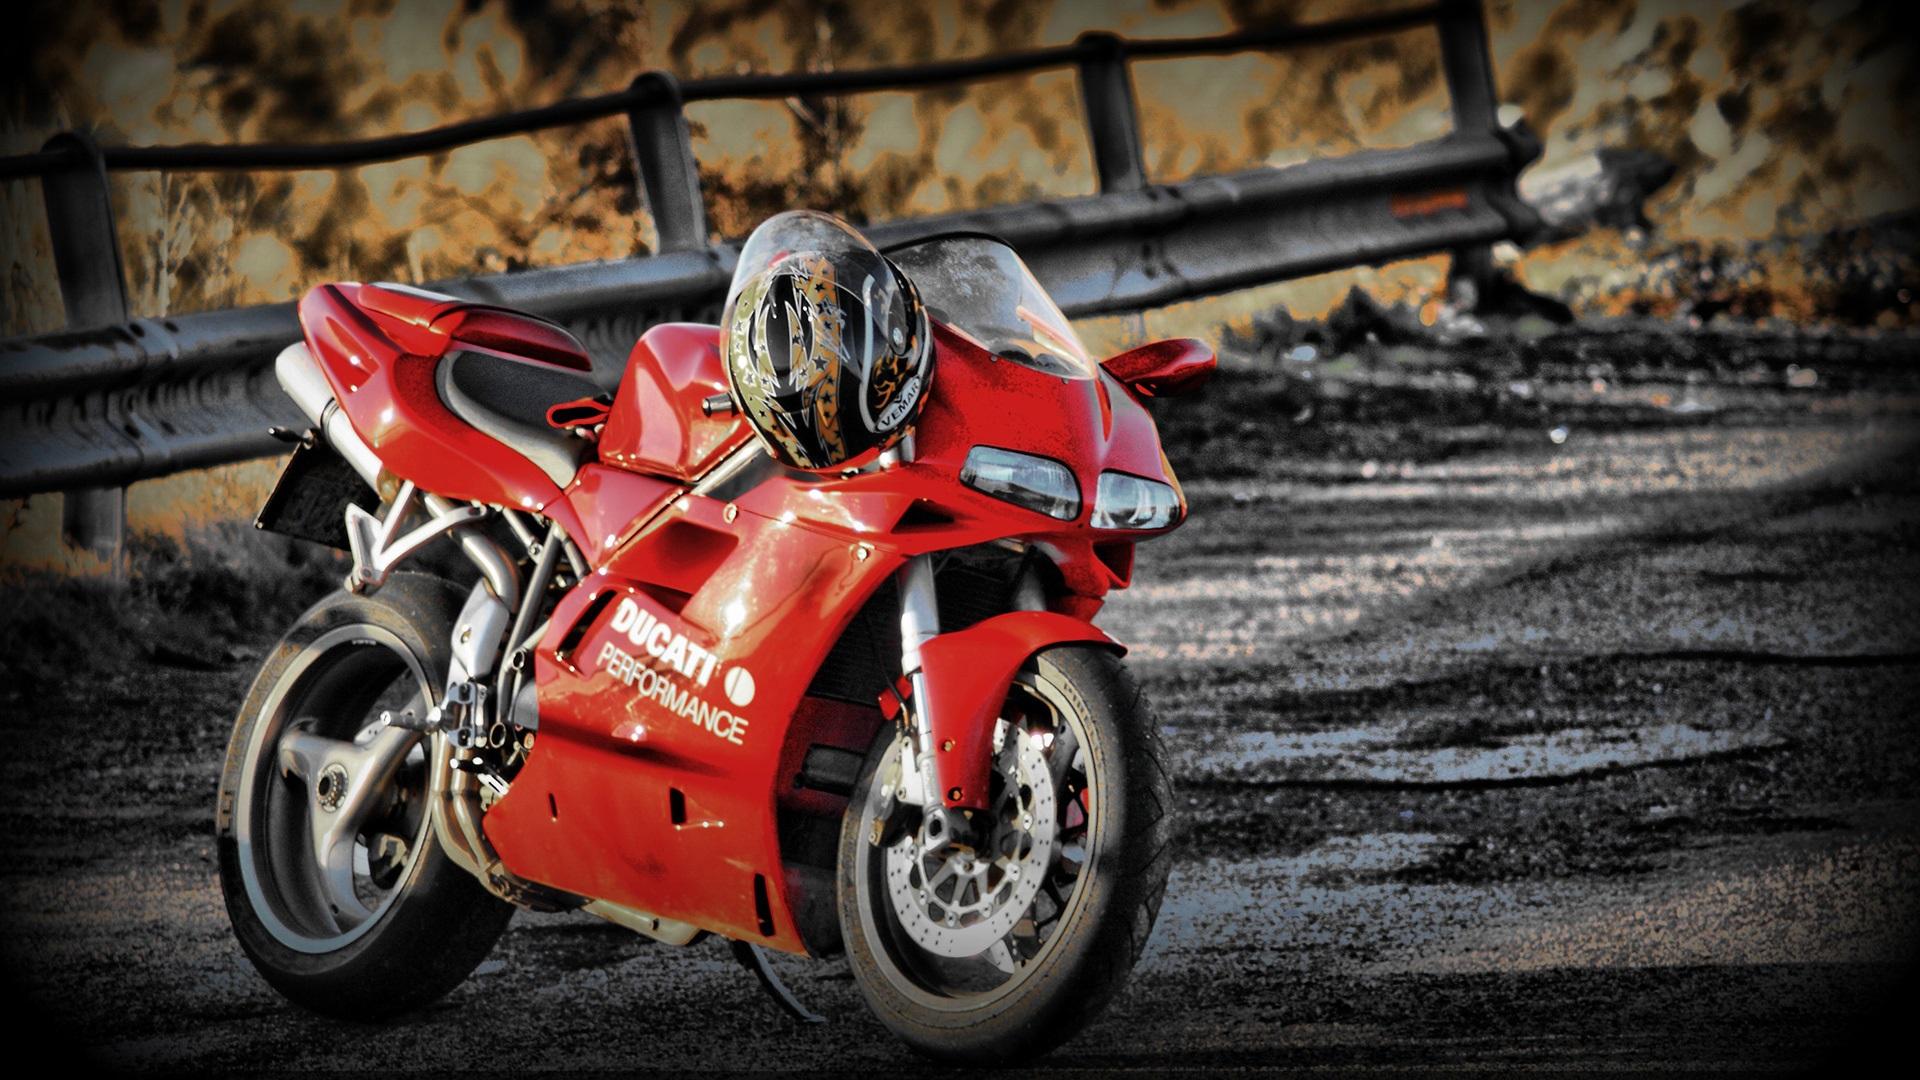 Fondos De Pantalla Ducati 748 Motocicleta De Color Rojo